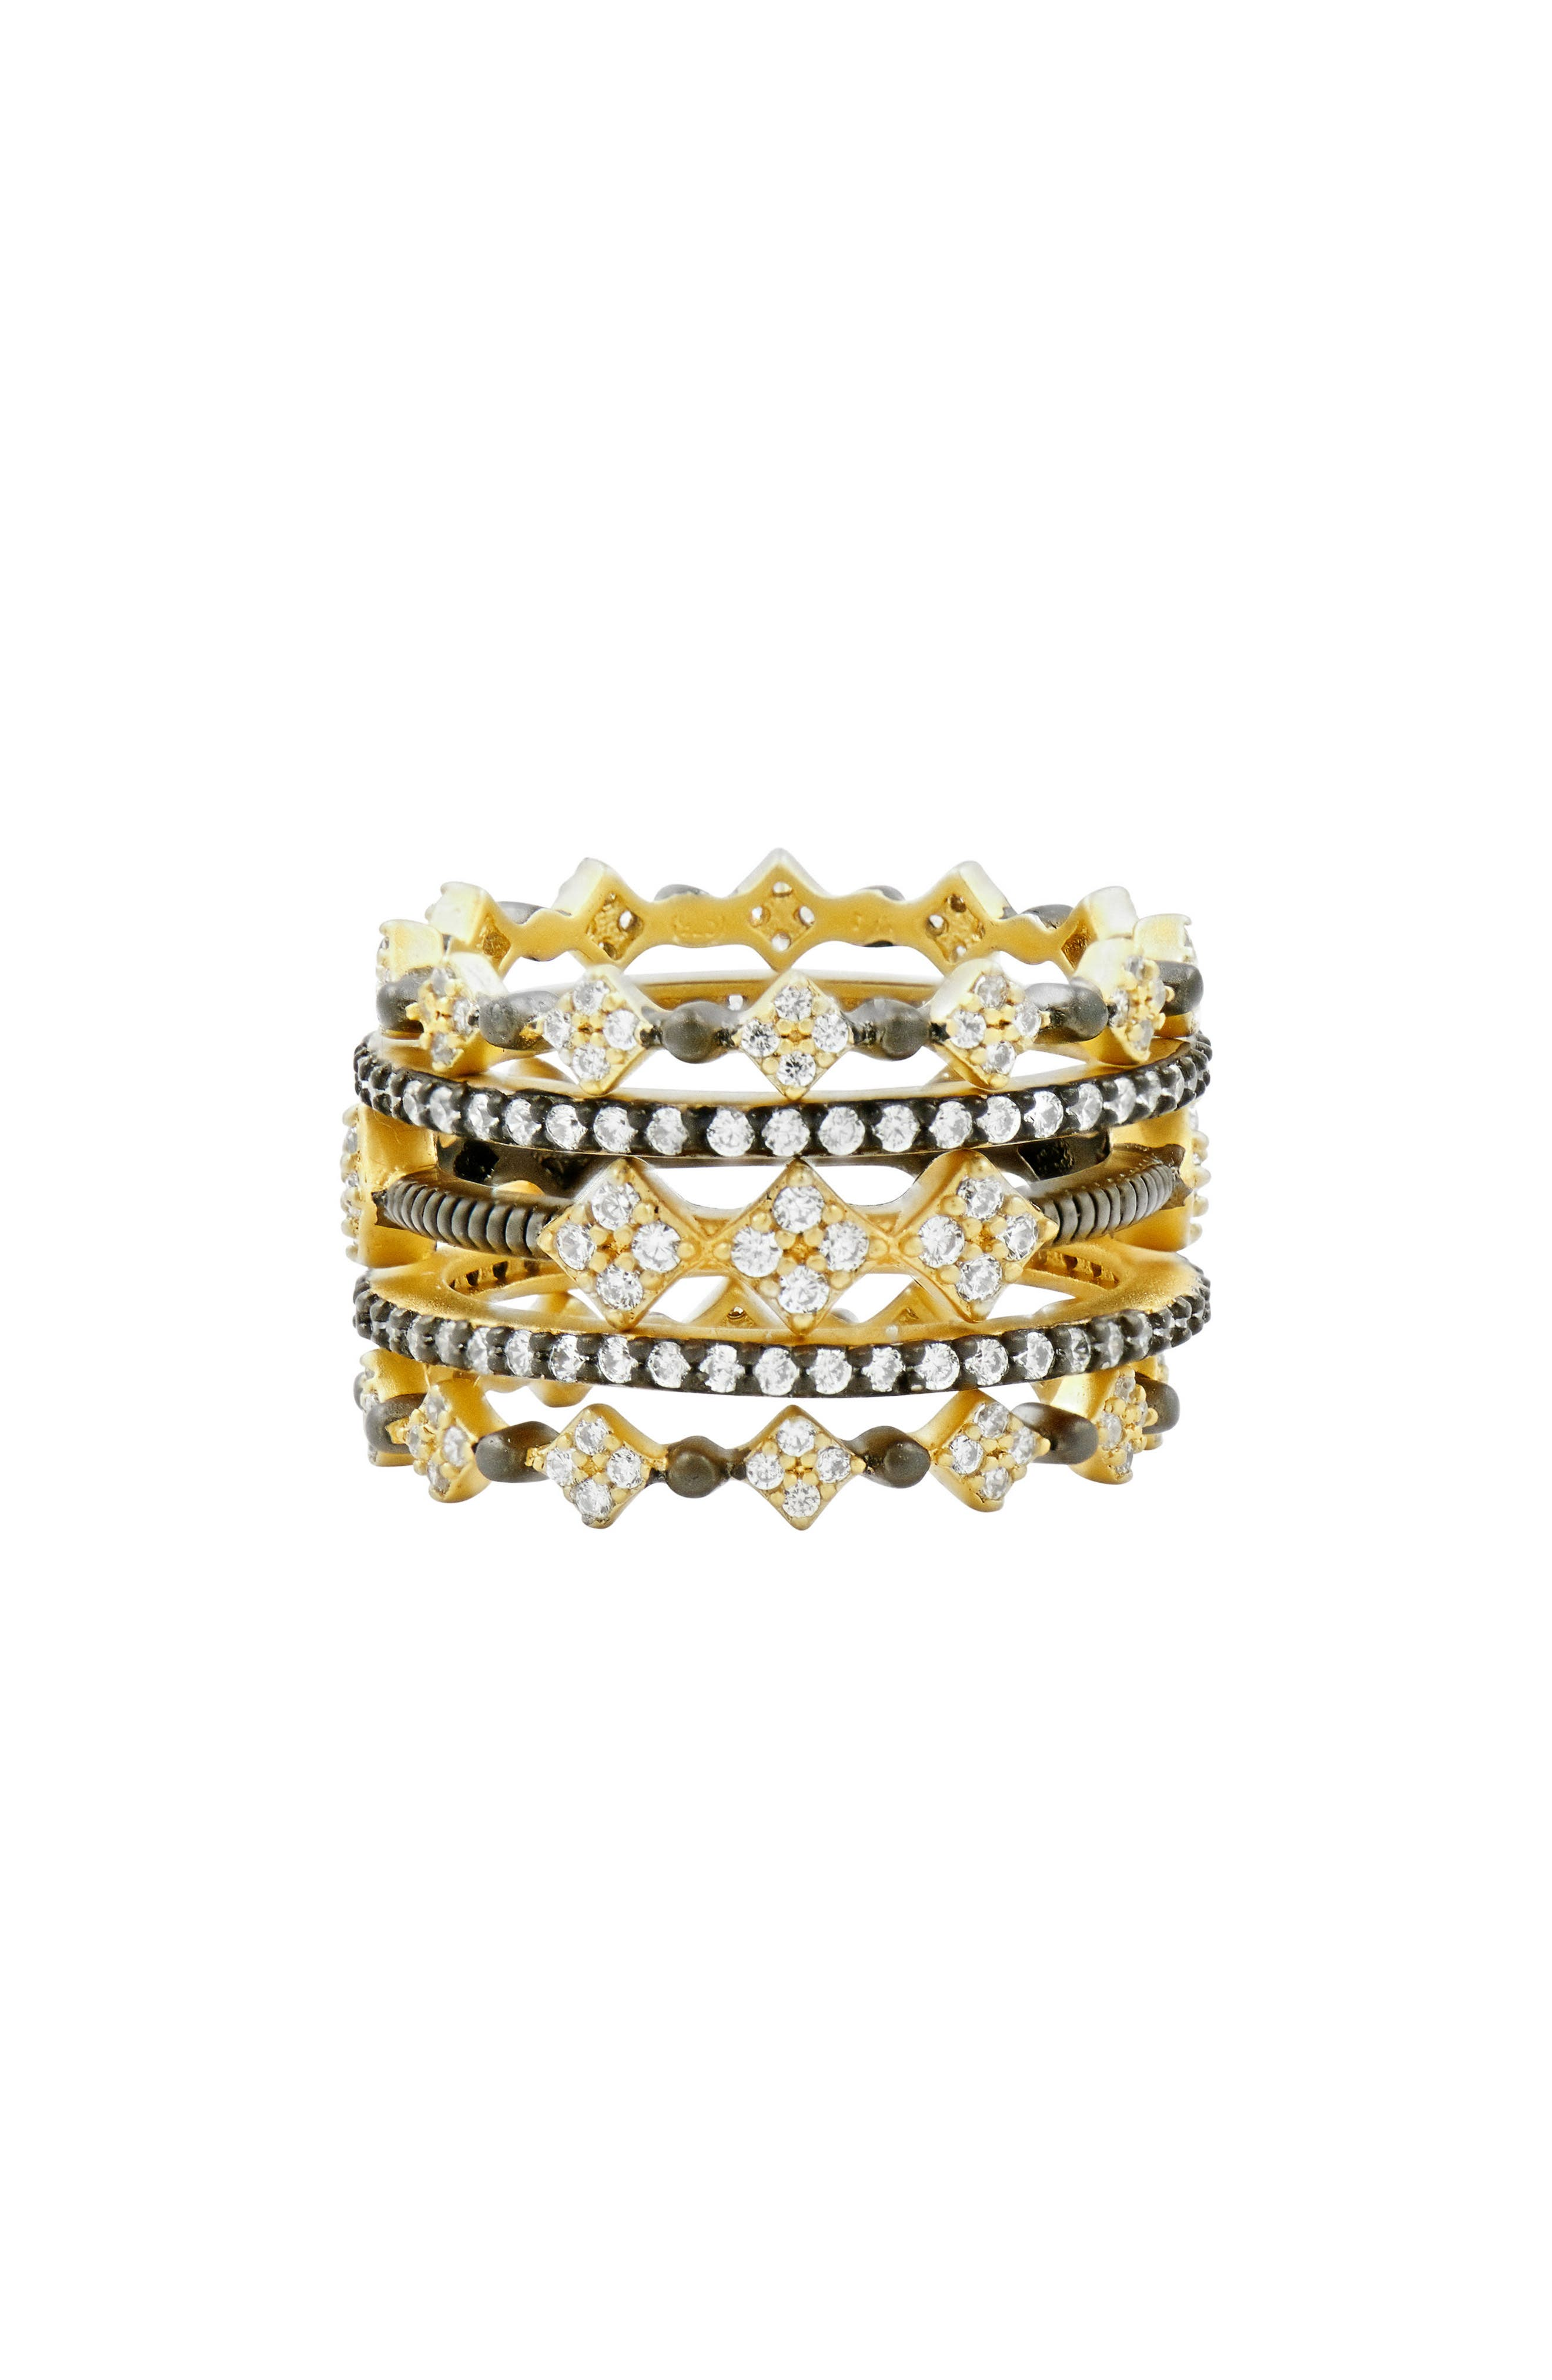 Rose Dor 5-Stack Rings,                             Main thumbnail 1, color,                             Black Rhodium/ Gold